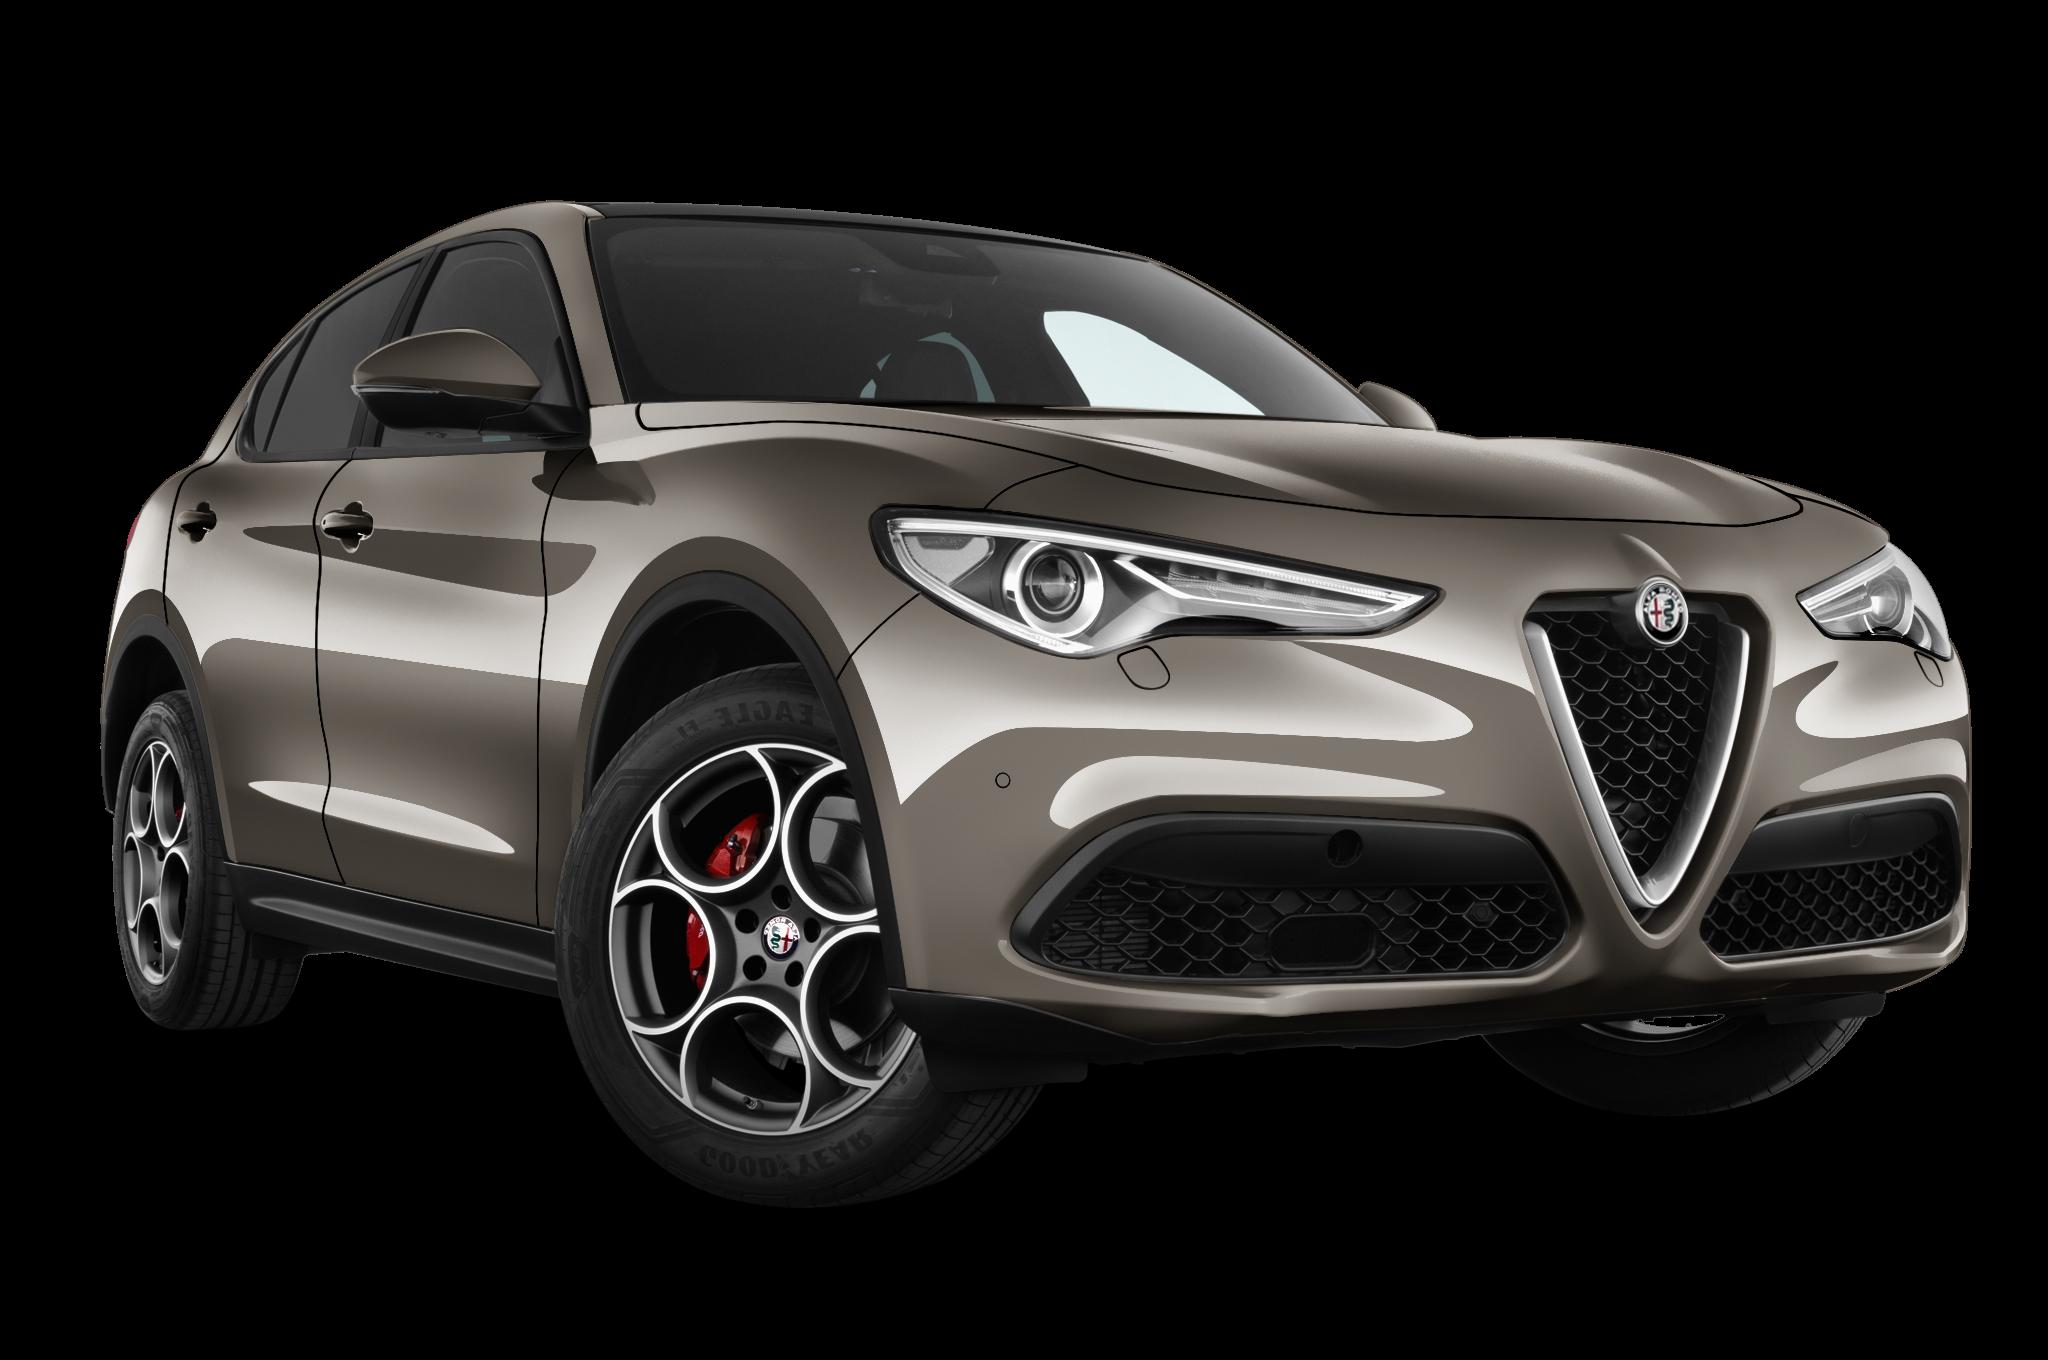 Alfa Romeo Stelvio Deals Offers Savings Up To 6 958 Carwow